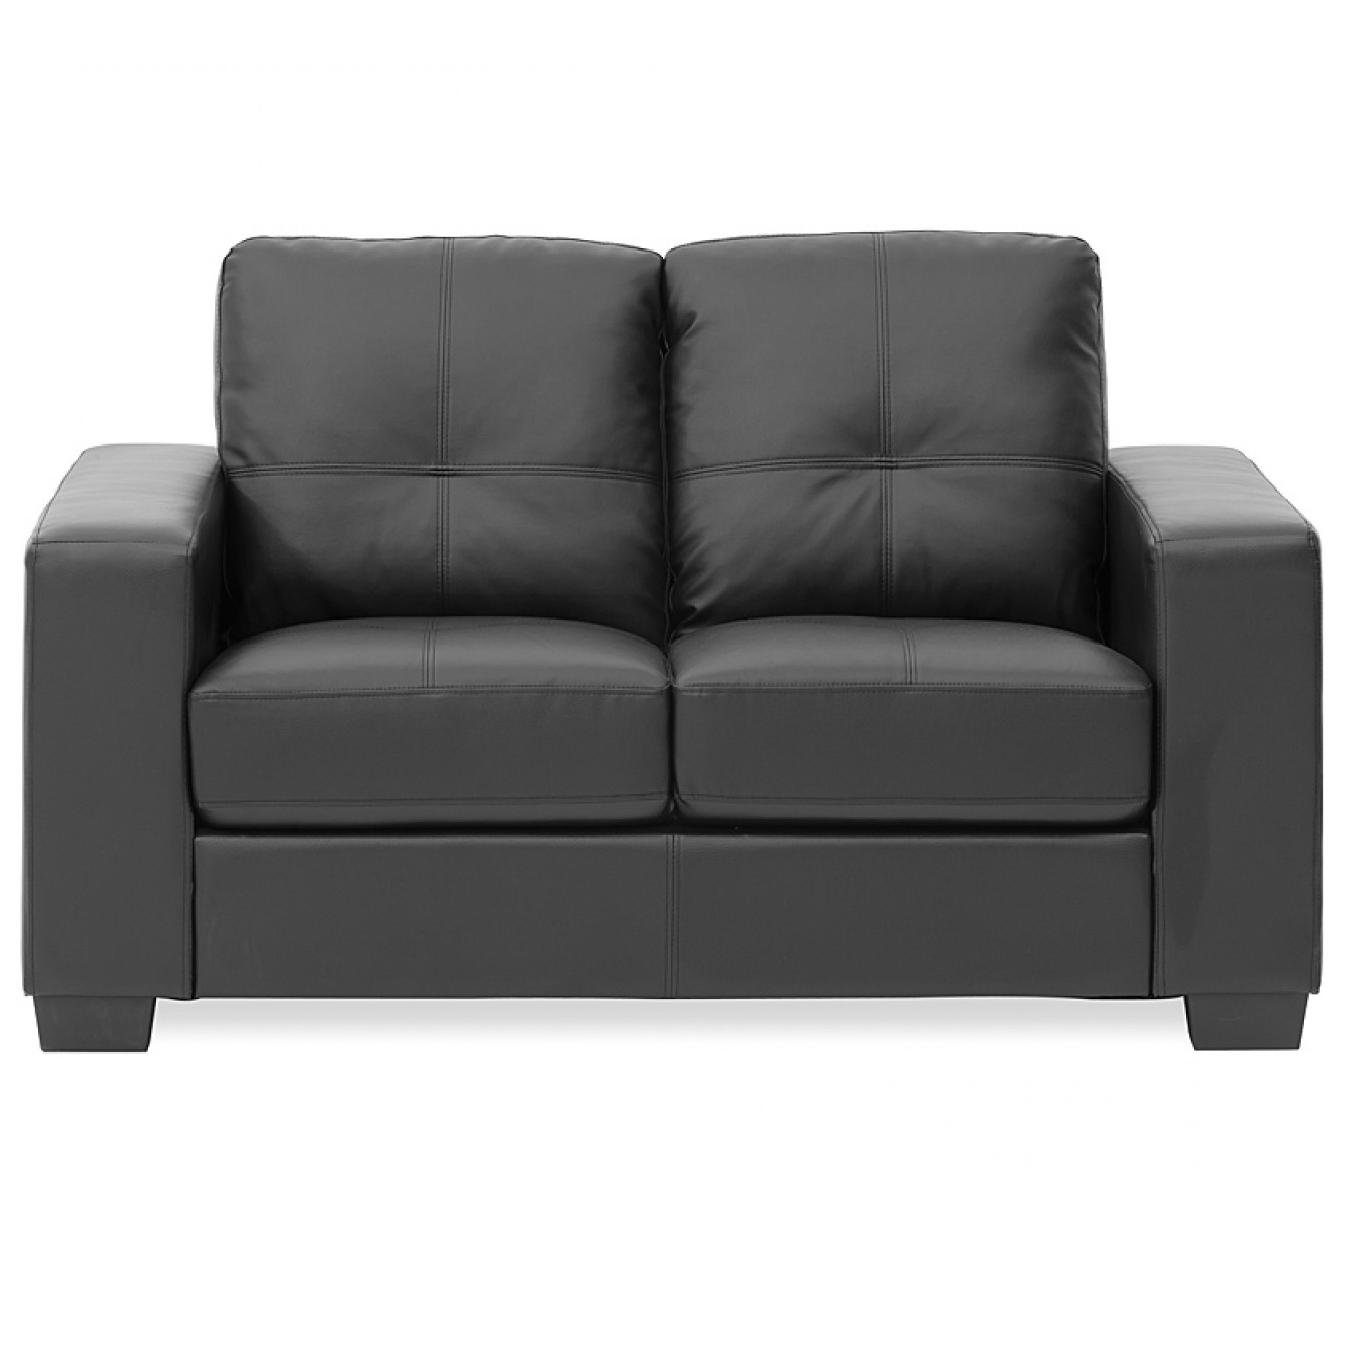 Leather Lounge - $200.00